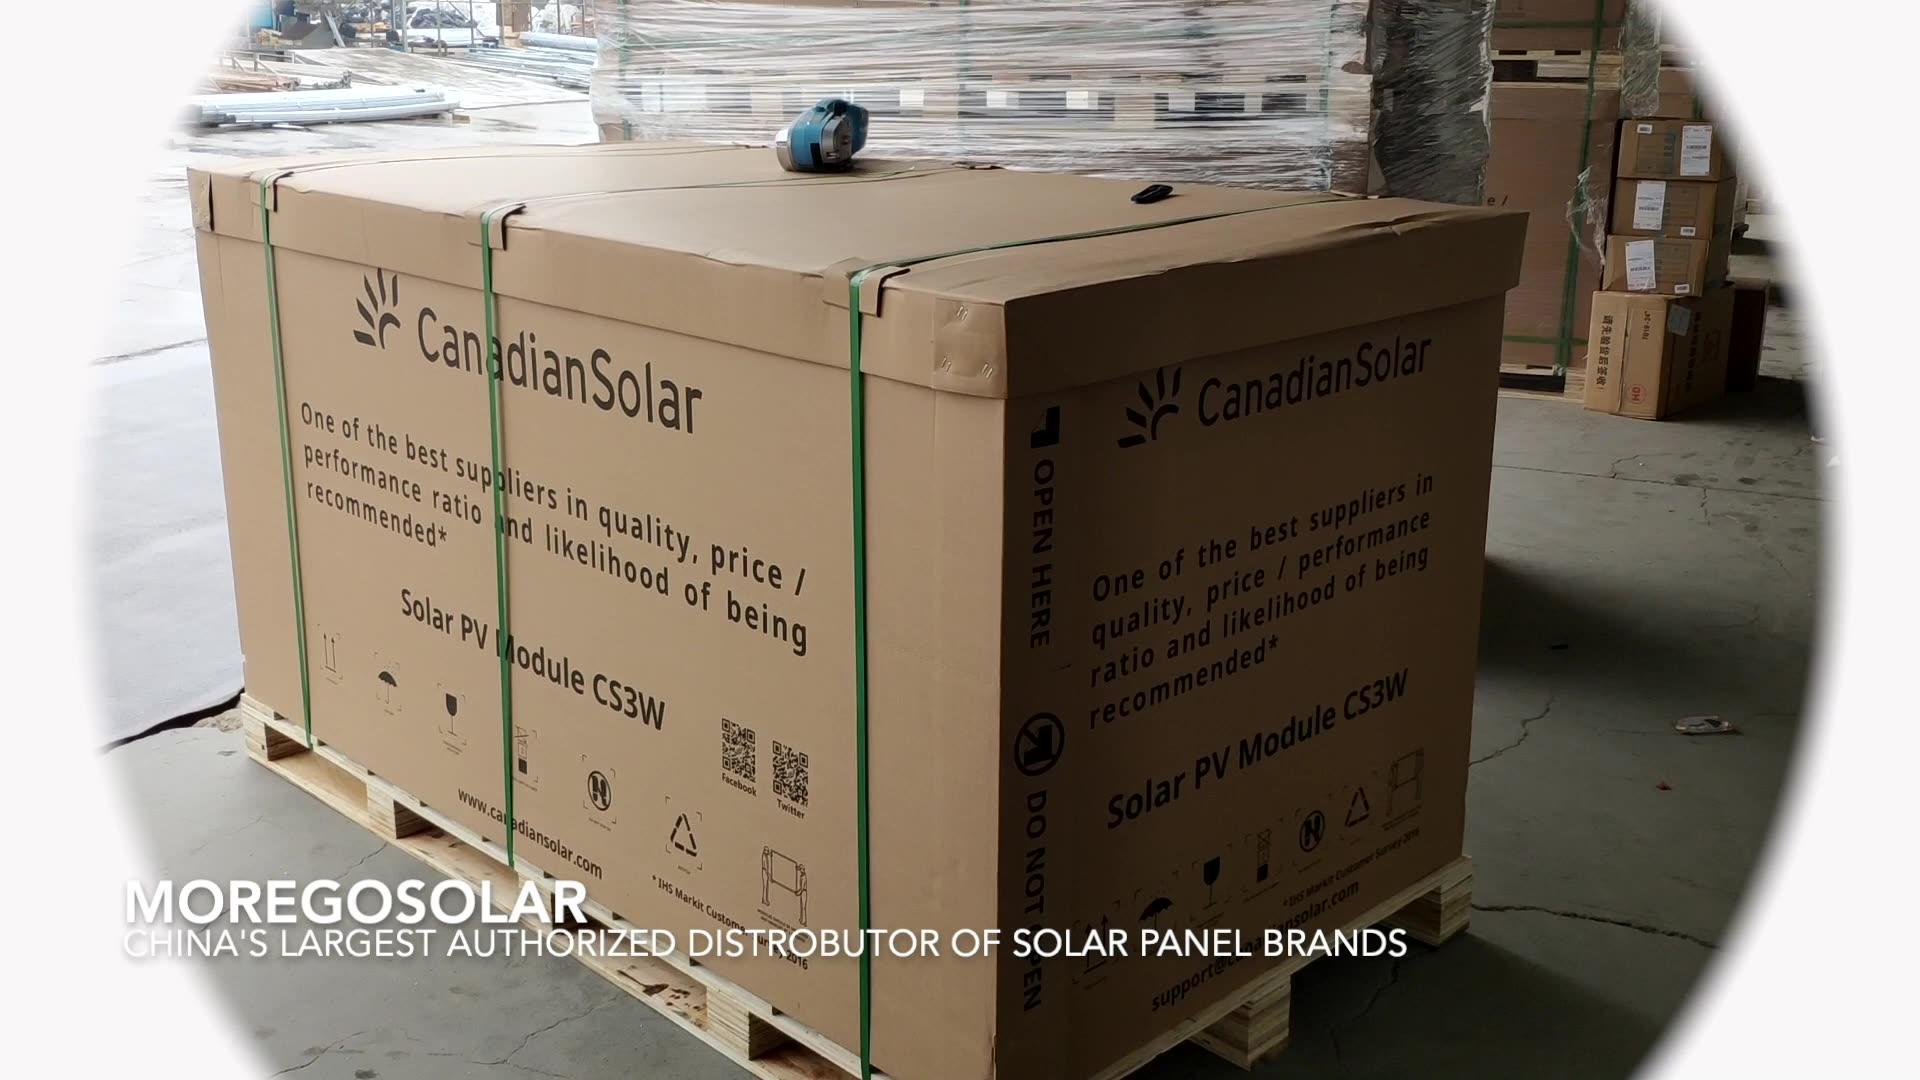 कनाडा सौर पैनल मॉड्यूल 360W 370W 380W 390W 395W 400W 410W 415W 420w 425w 430w 435w पाली सौर पैनल कीमत